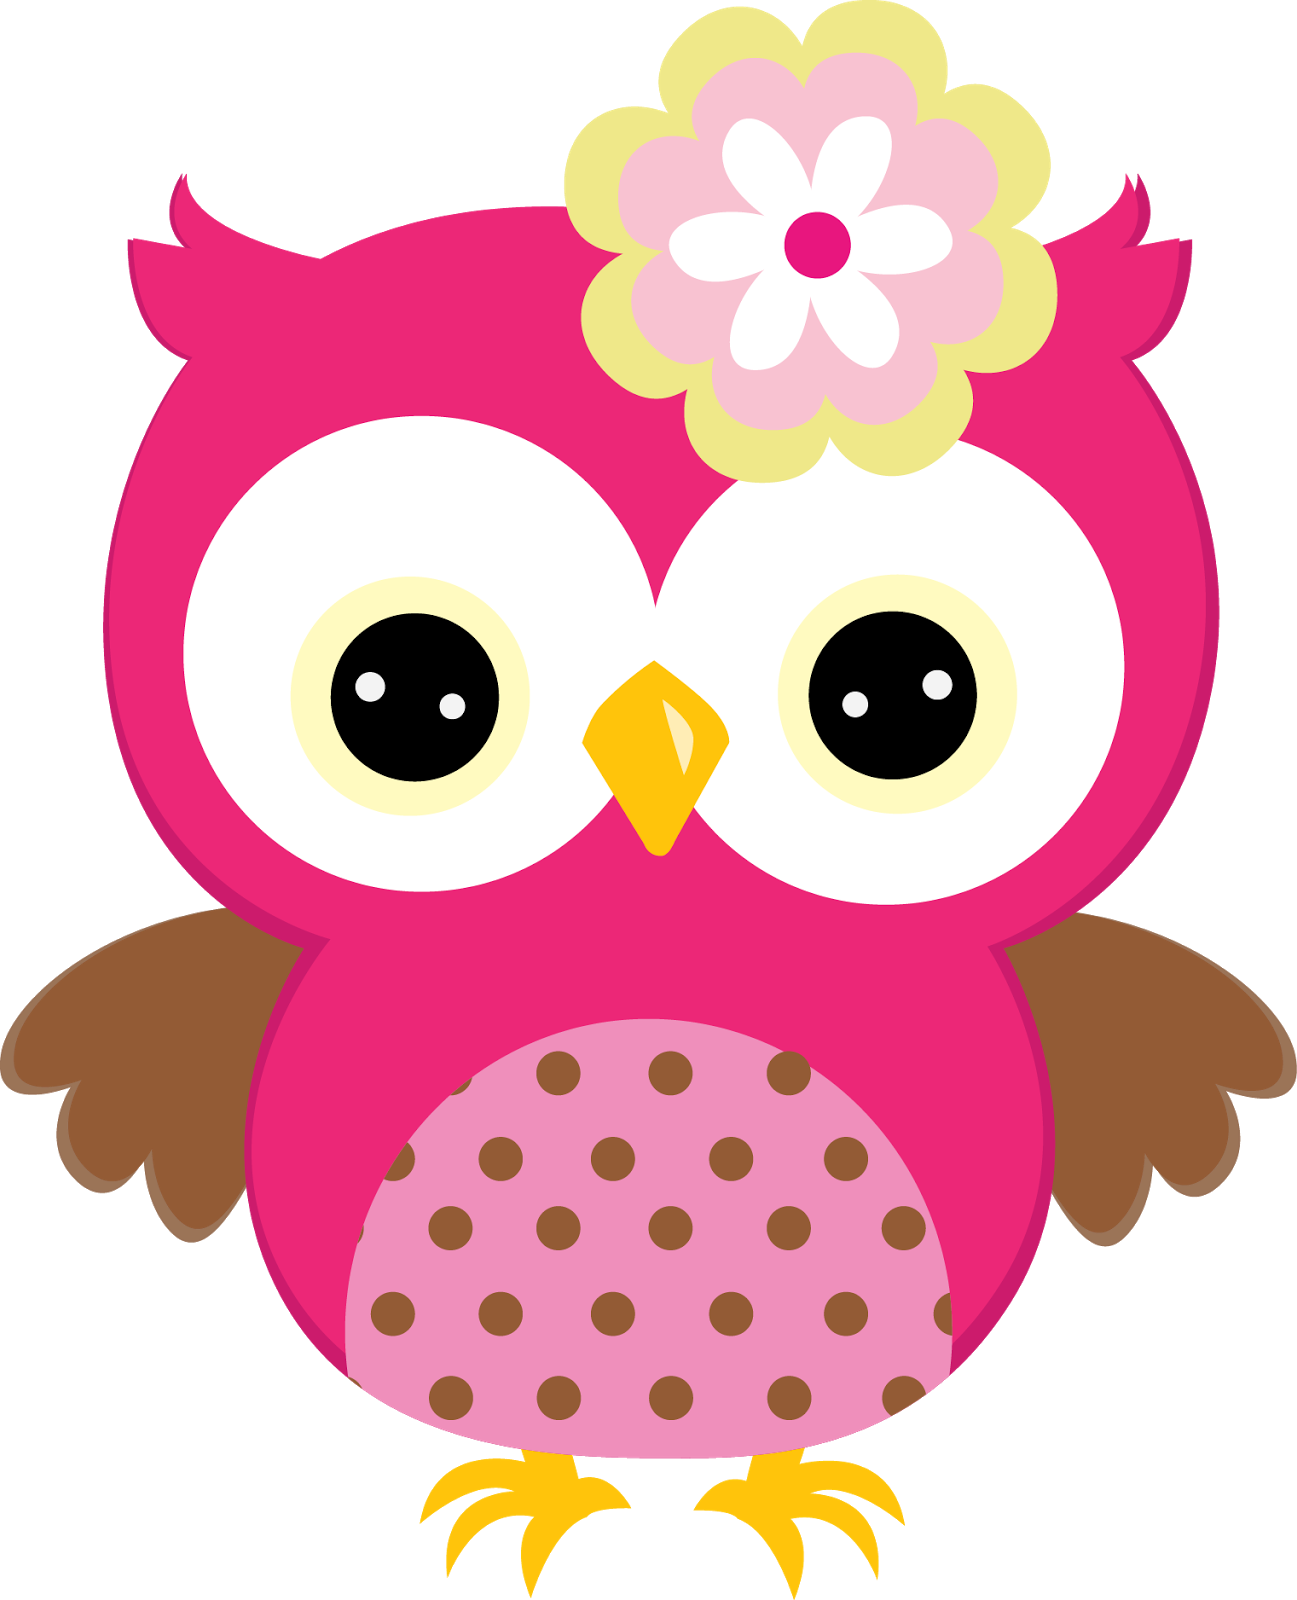 Owls clipart easy. Im genes de b